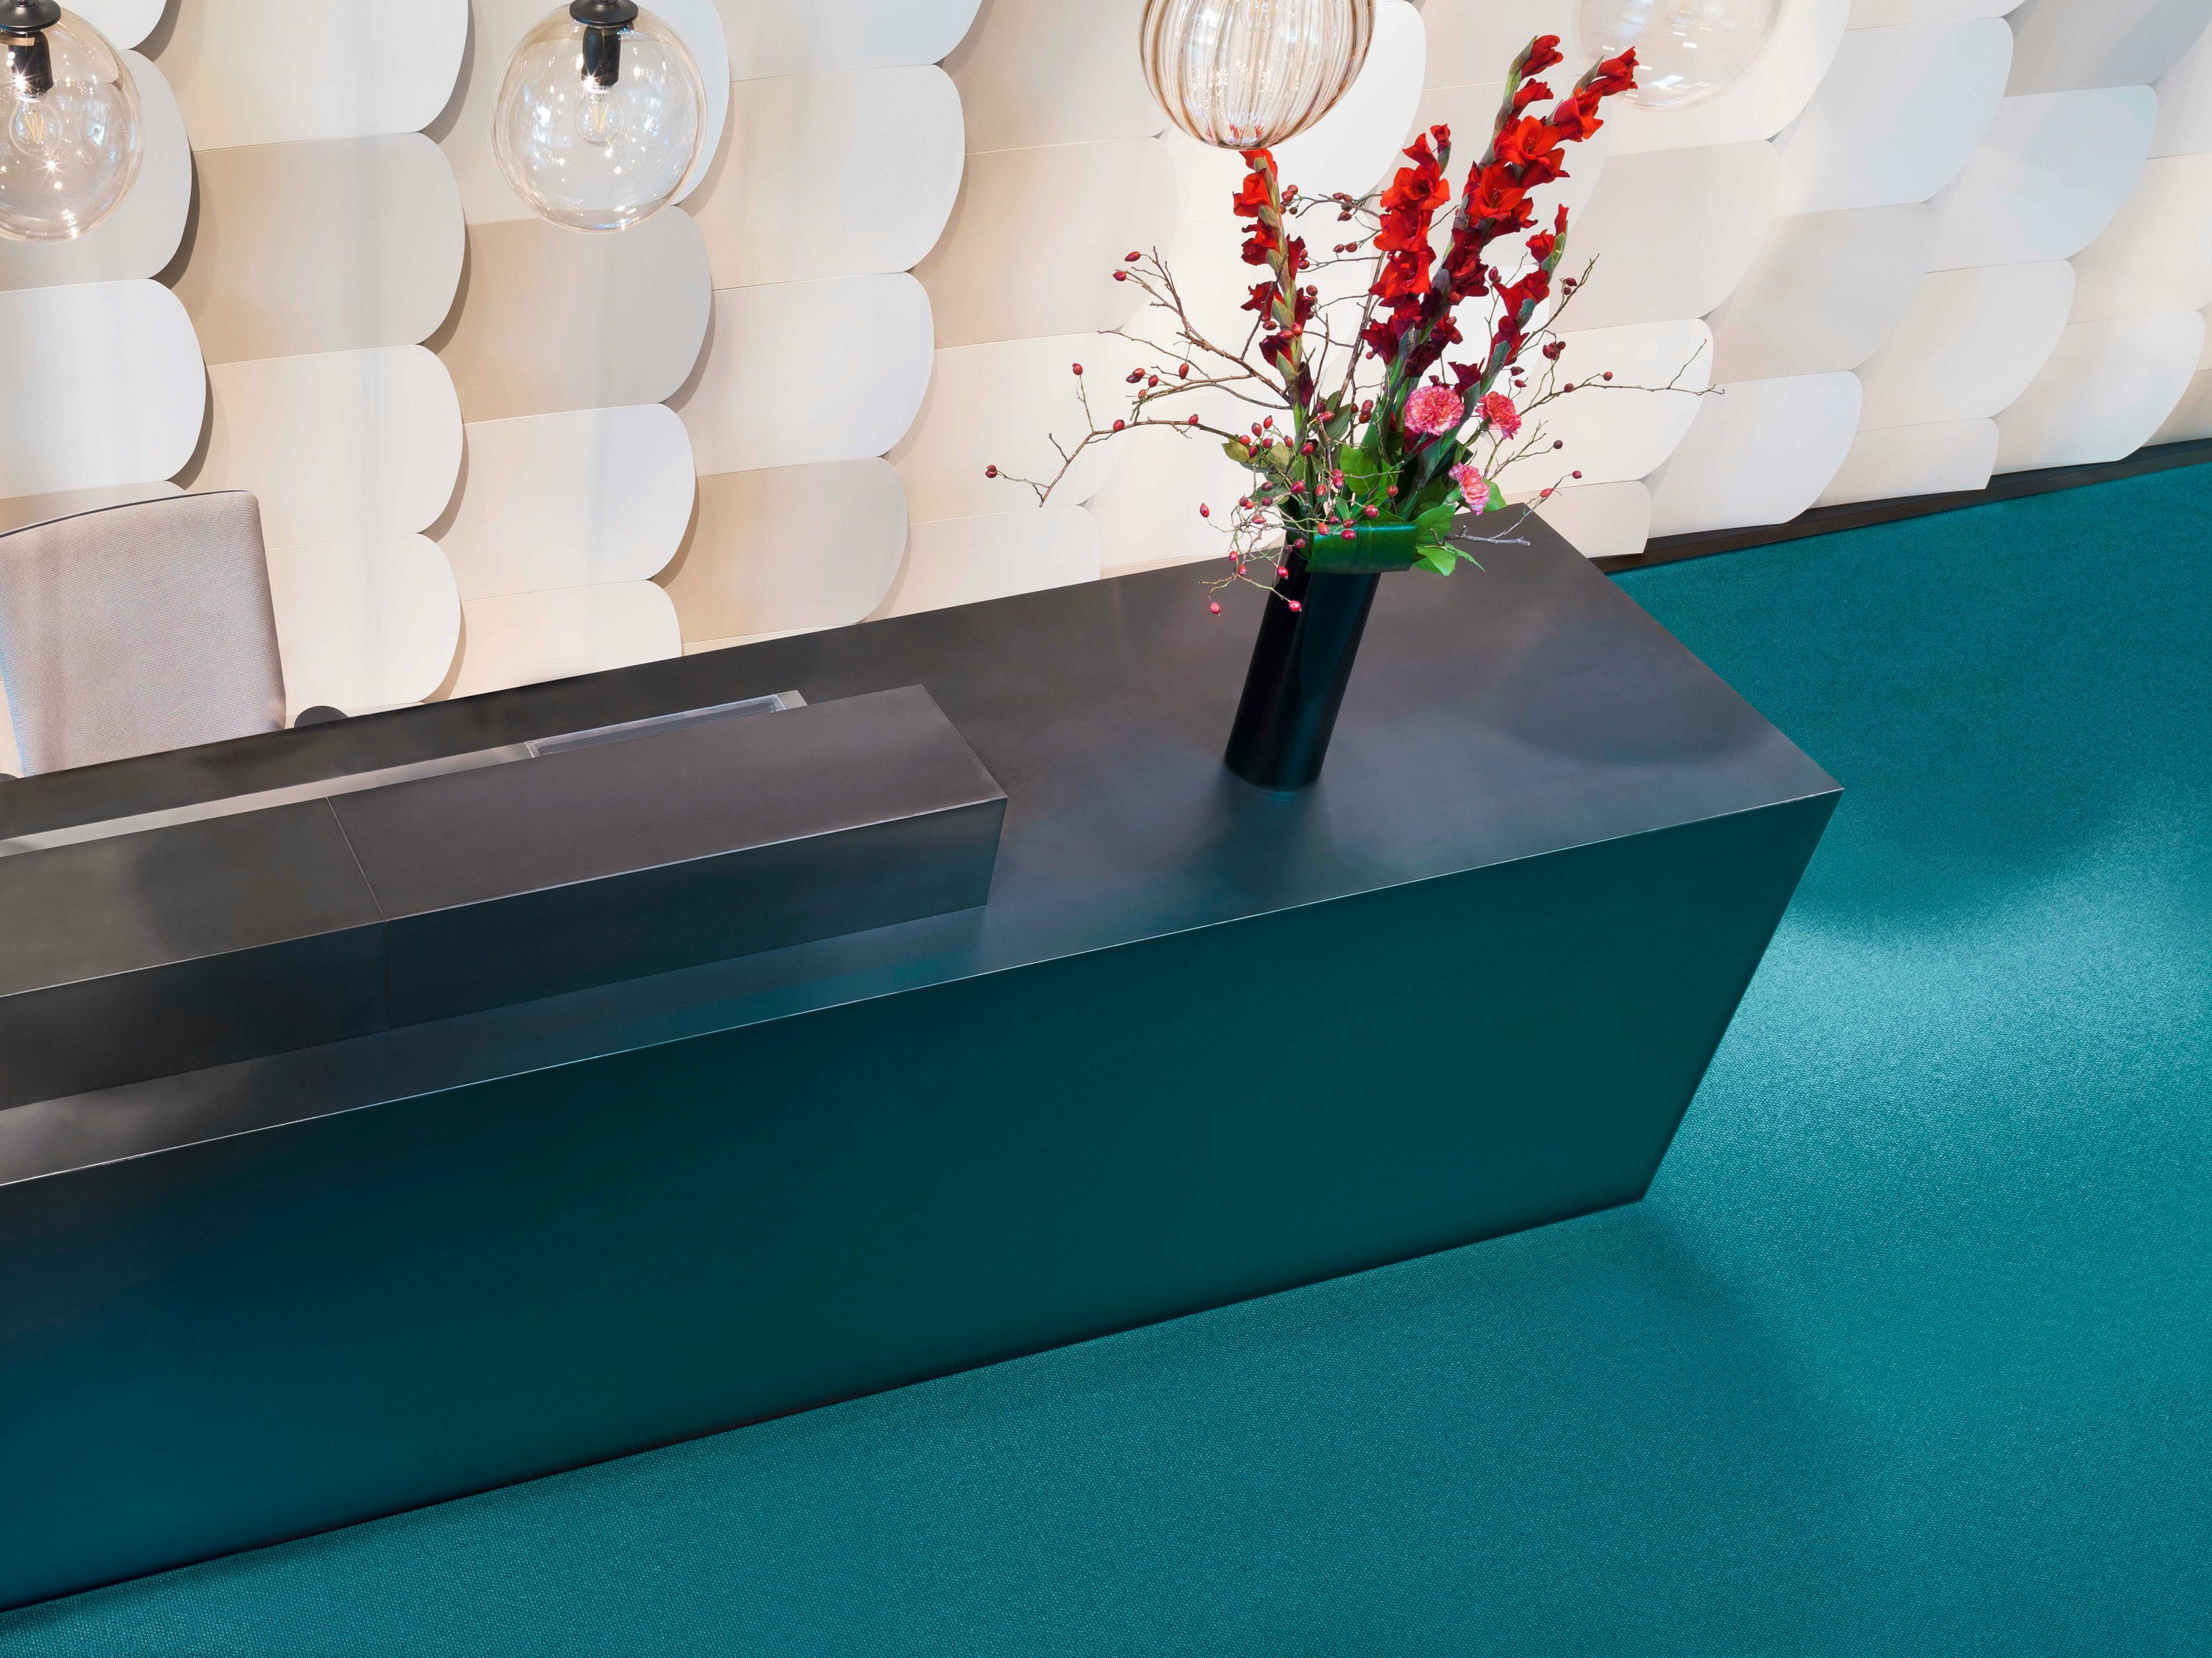 uni teppichboden format by vorwerk co teppichwerke. Black Bedroom Furniture Sets. Home Design Ideas